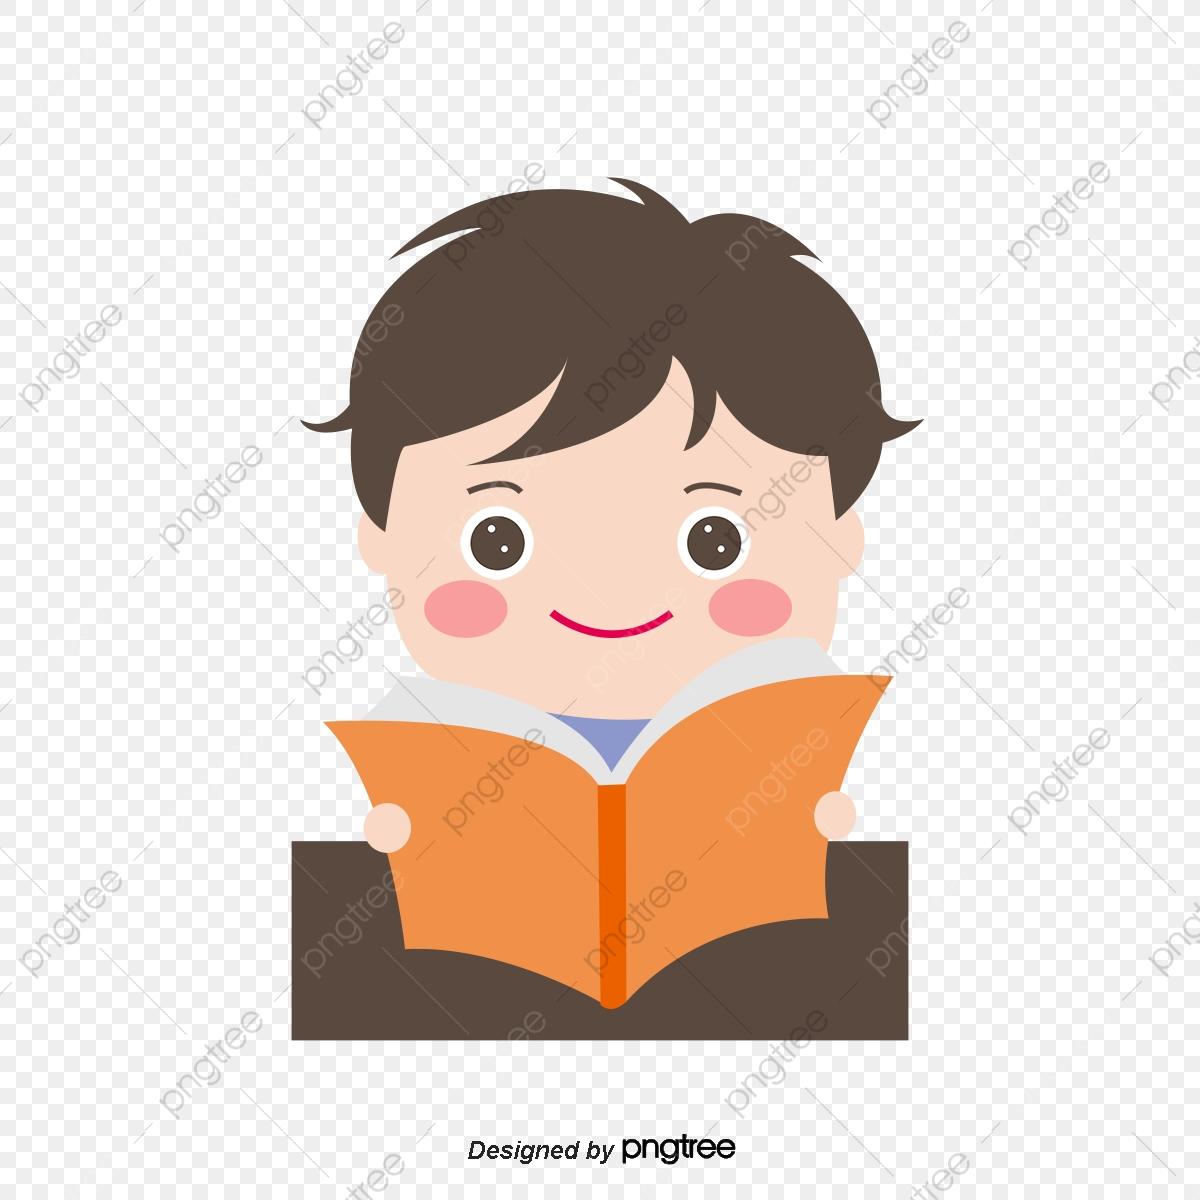 Cartoon children read carefully. Study clipart cute